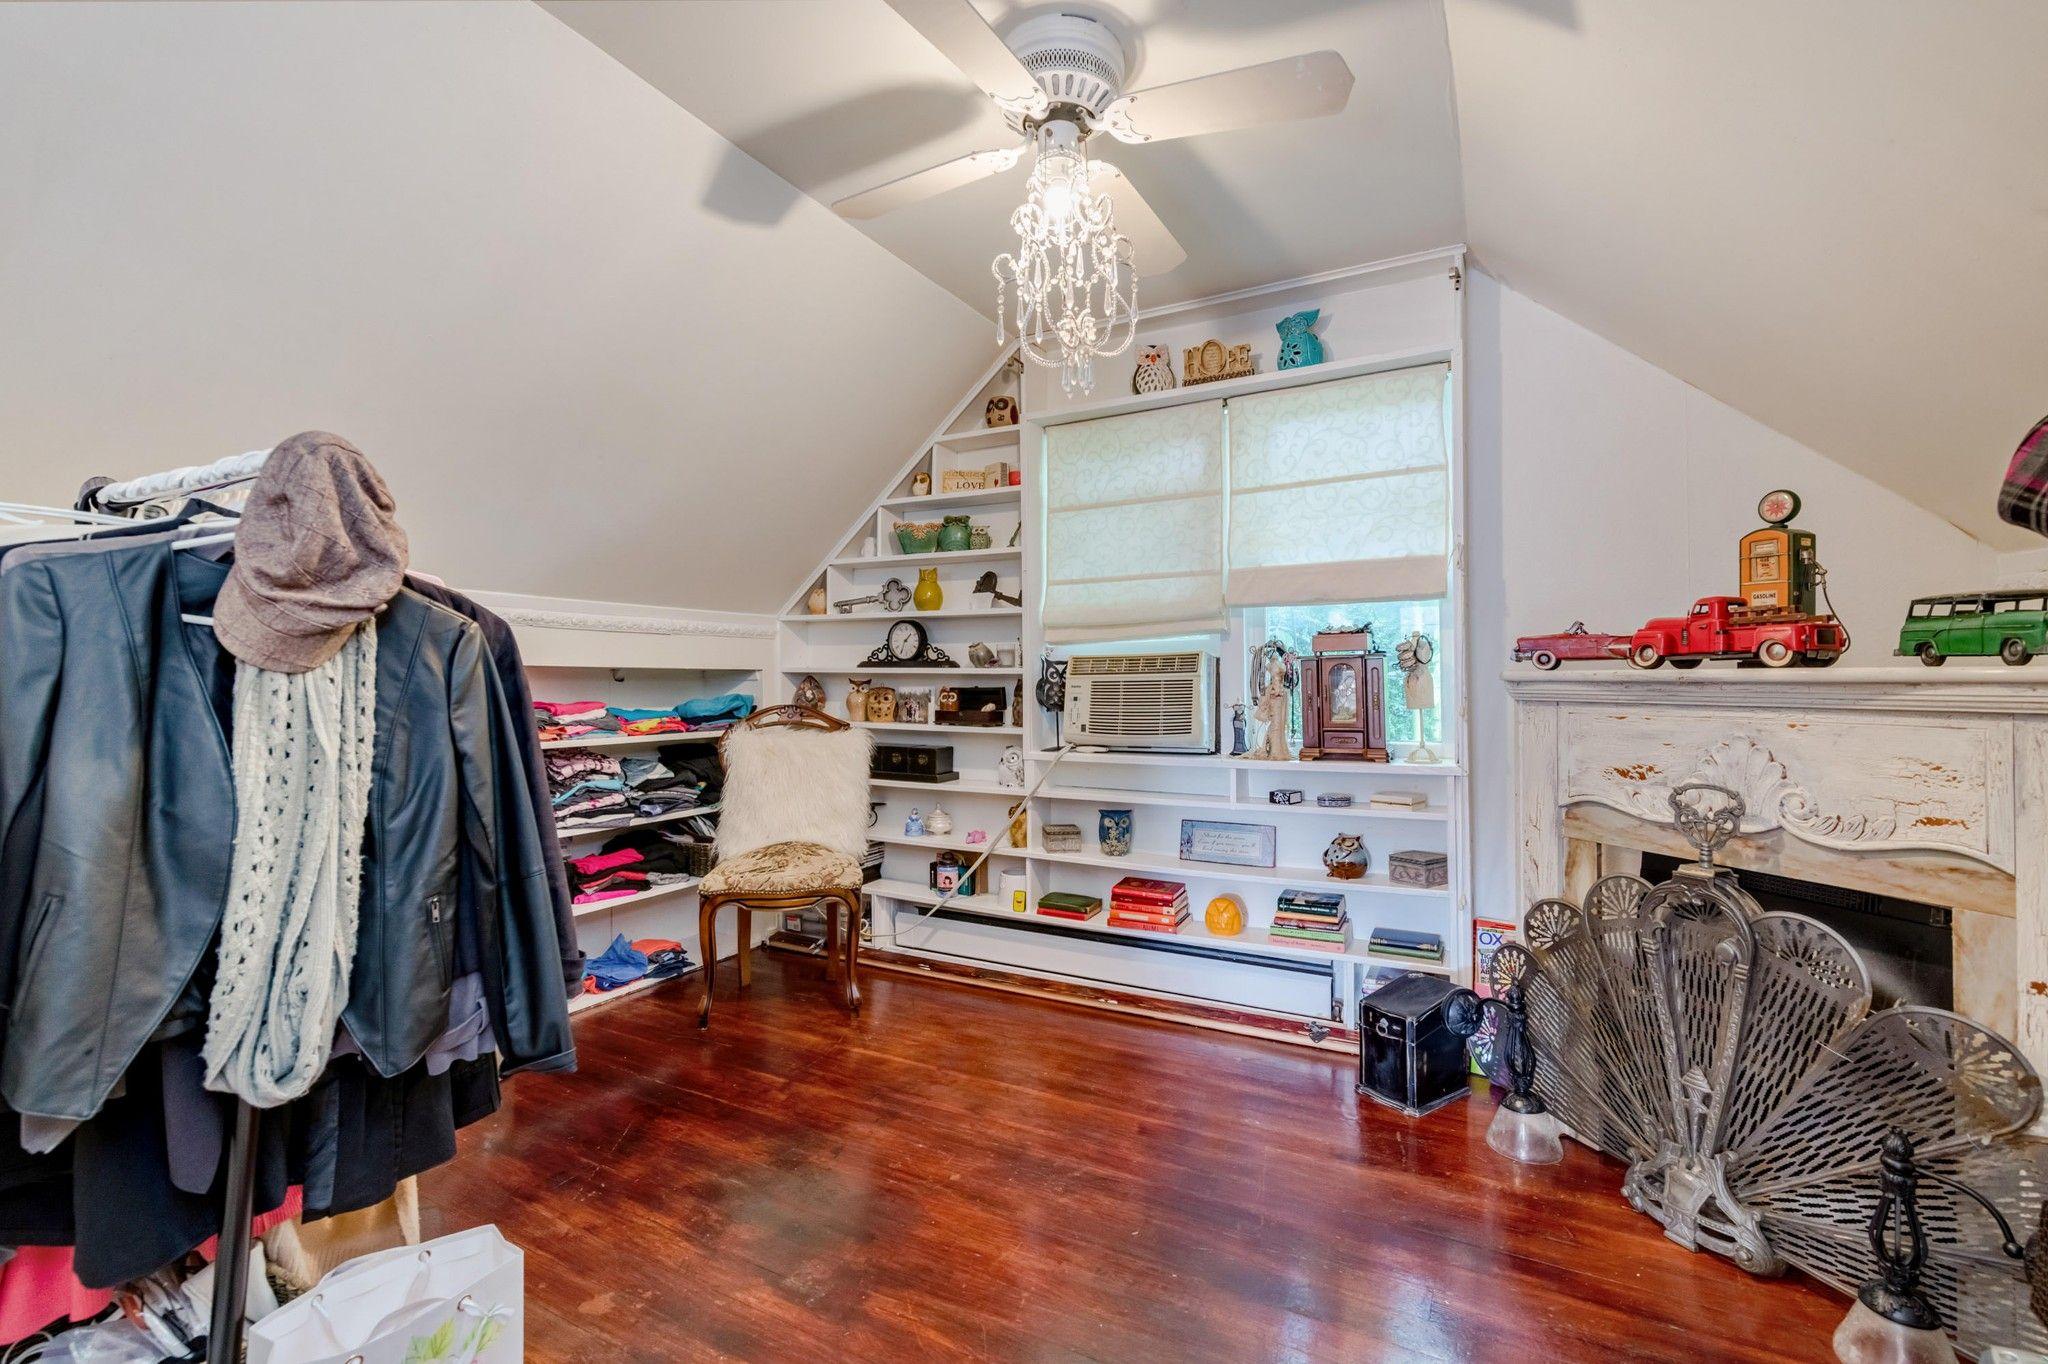 Photo 12: Photos: 20623 114 Avenue in Maple Ridge: Southwest Maple Ridge House for sale : MLS®# R2465656